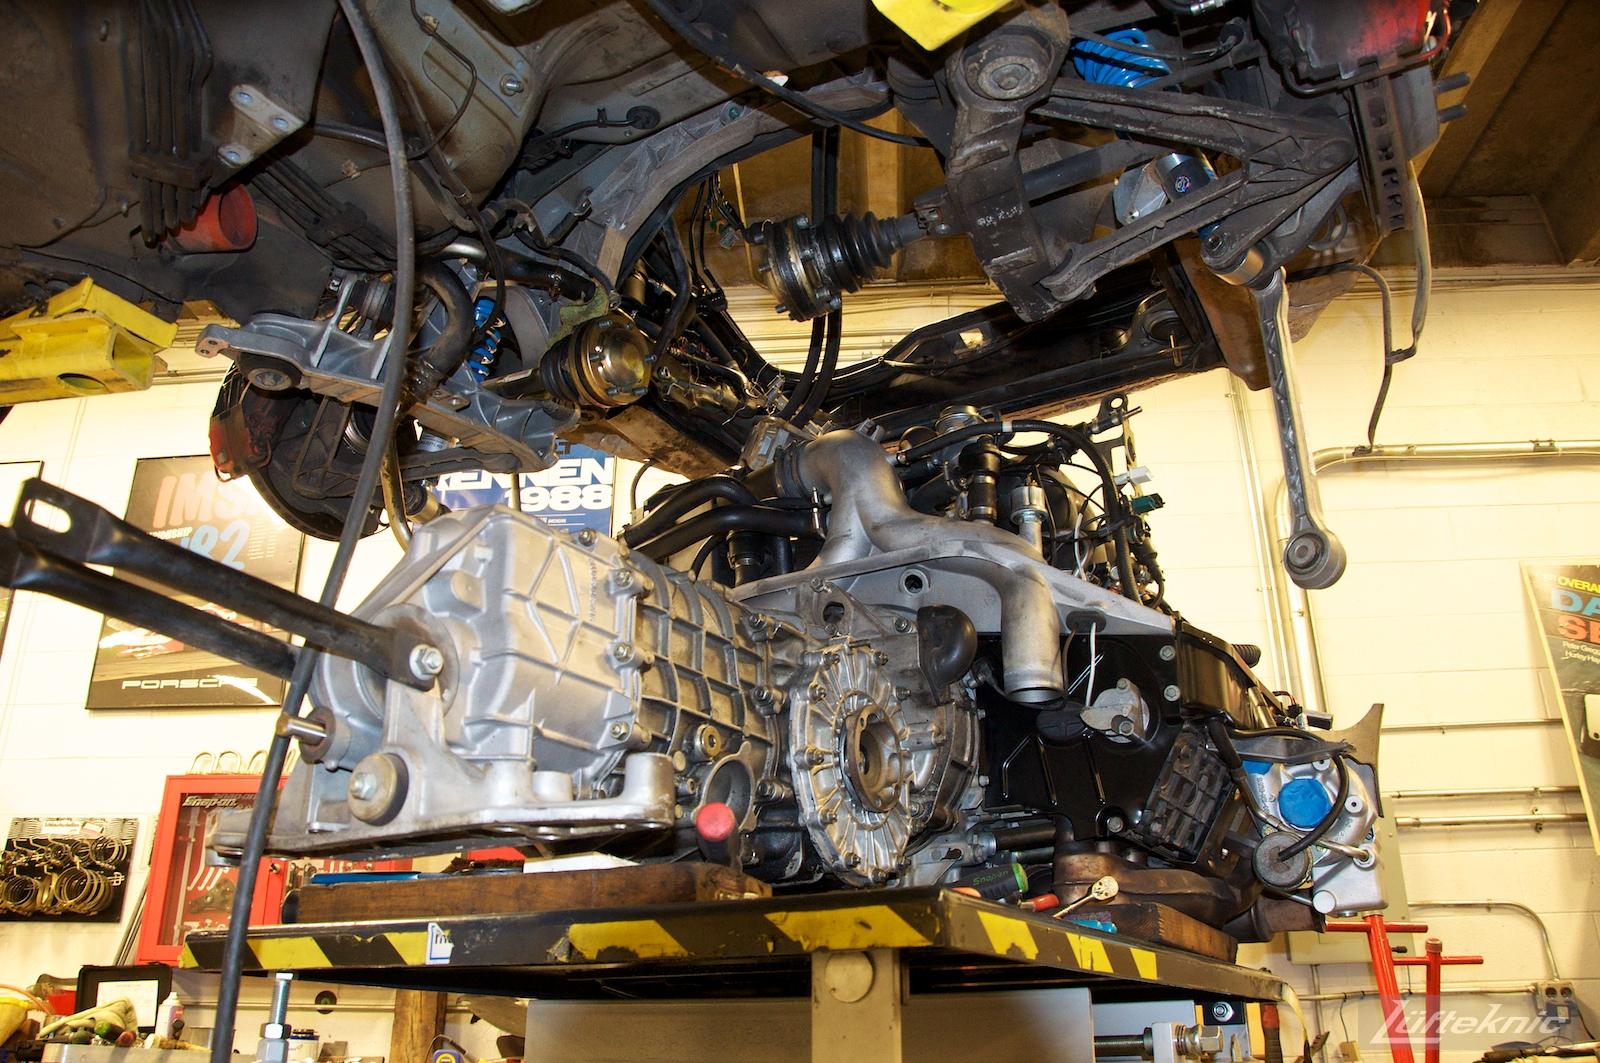 993 Turbo driveline being reinstalled after rebuilding.